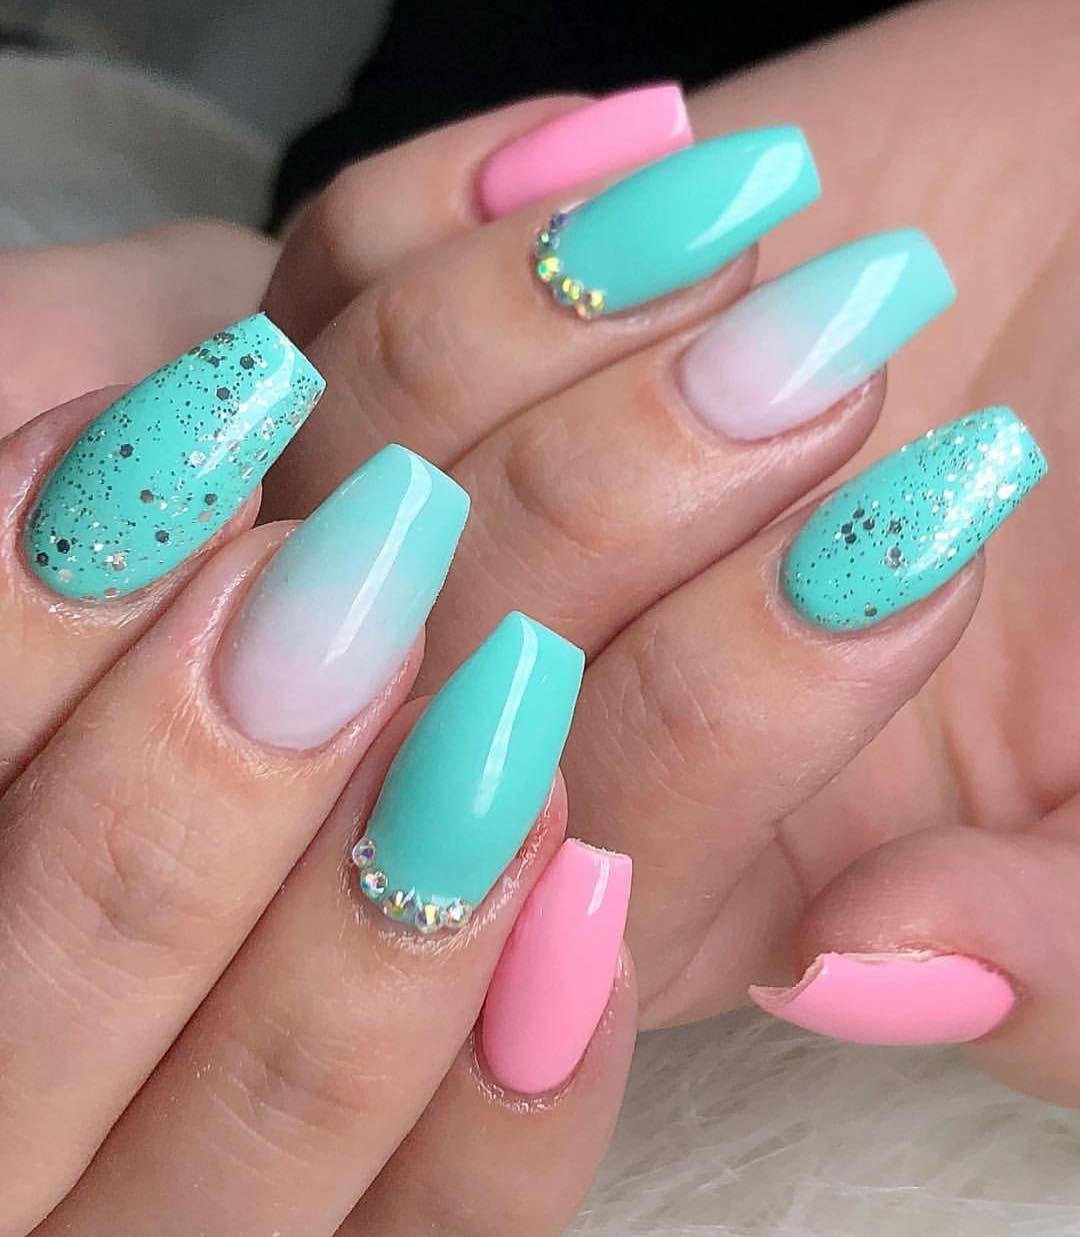 Beautiful chic and cheerful nail art designs